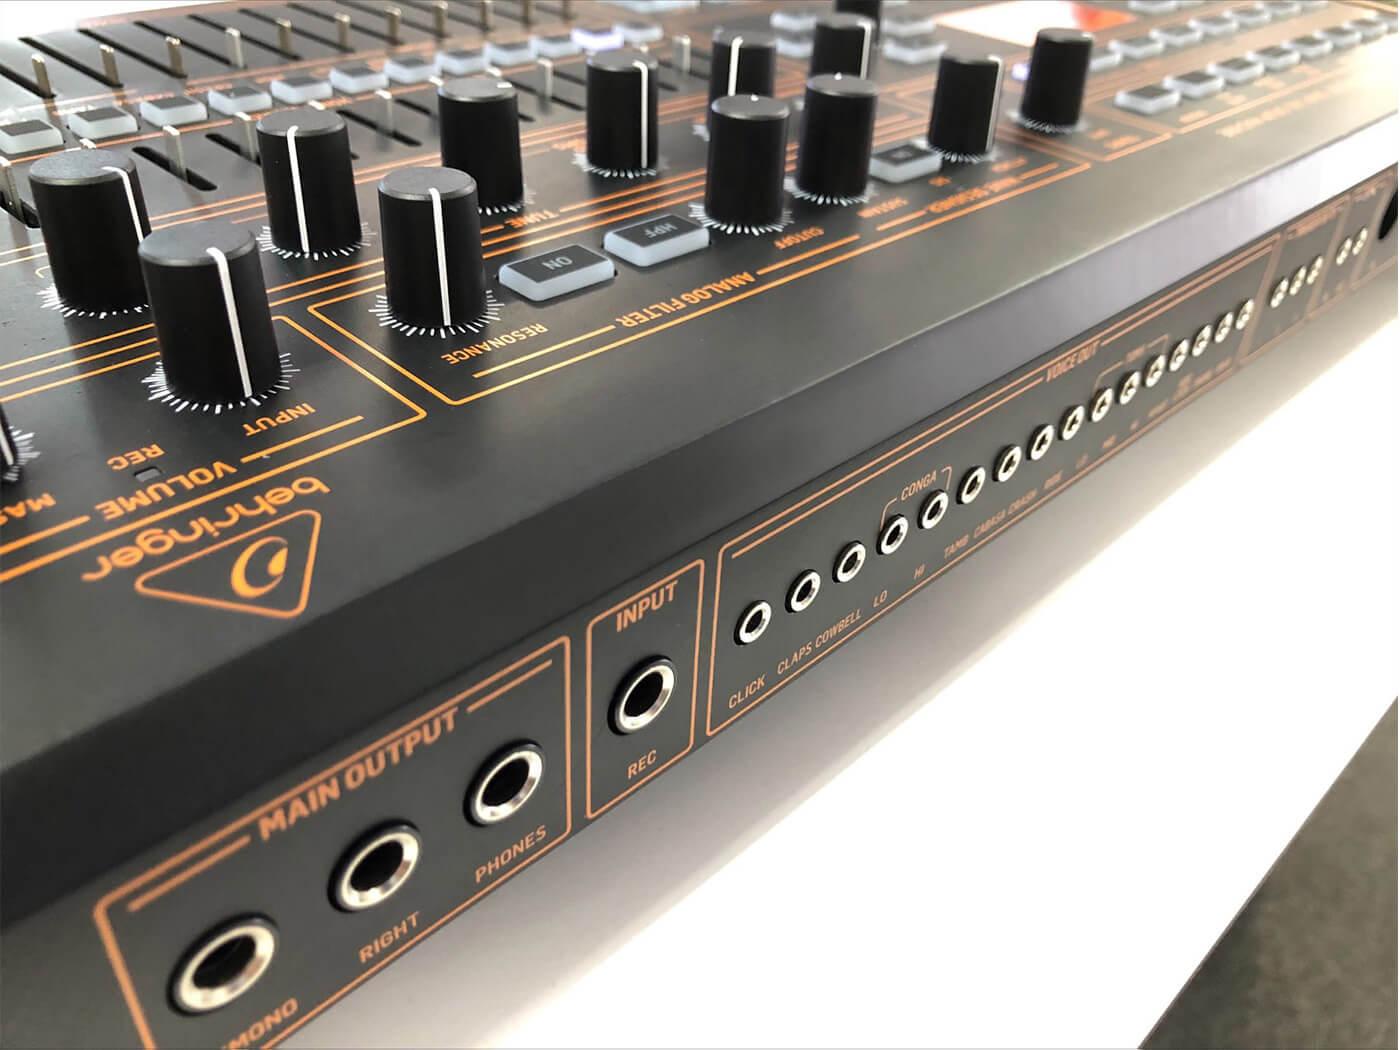 Behringer shares progress of new LmDrum drum machine inspired by the LinnDrum | MusicTech